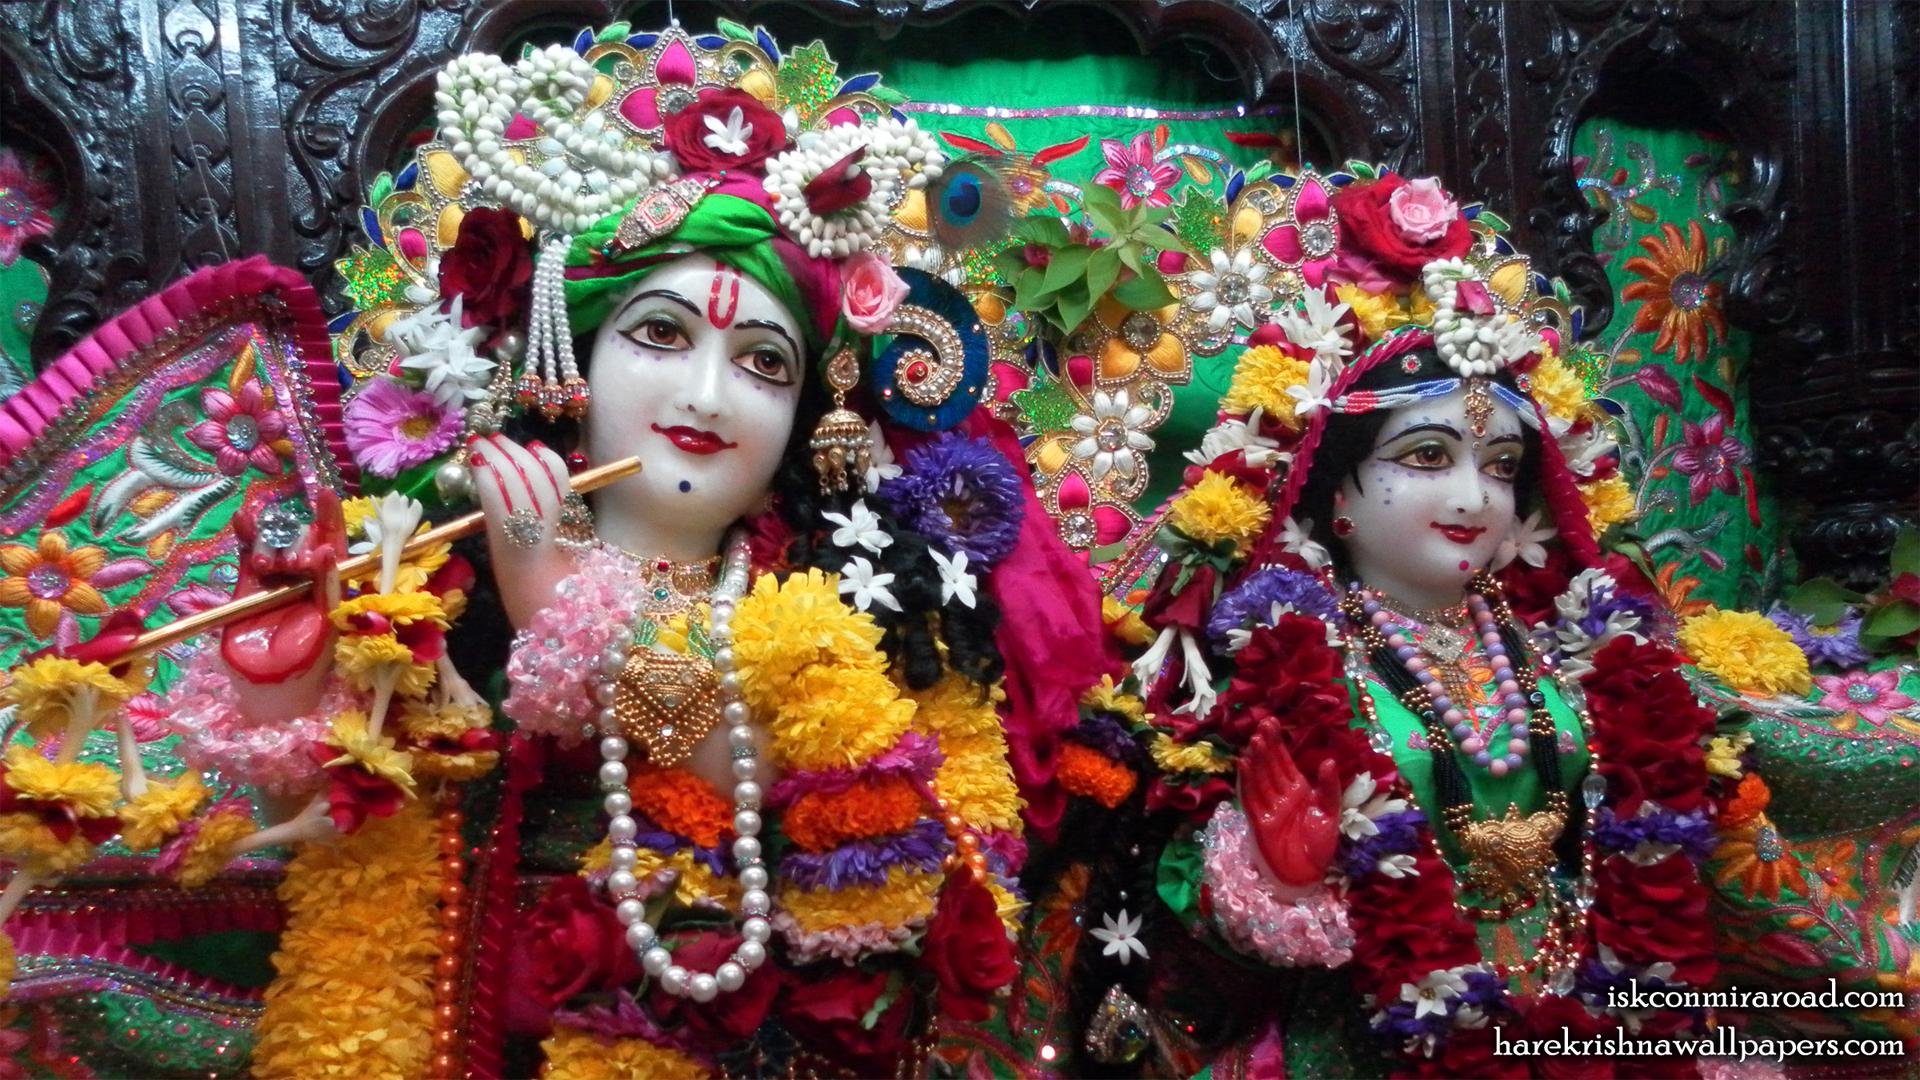 Sri Sri Radha Giridhari Close up Wallpaper (024) Size 1920x1080 Download